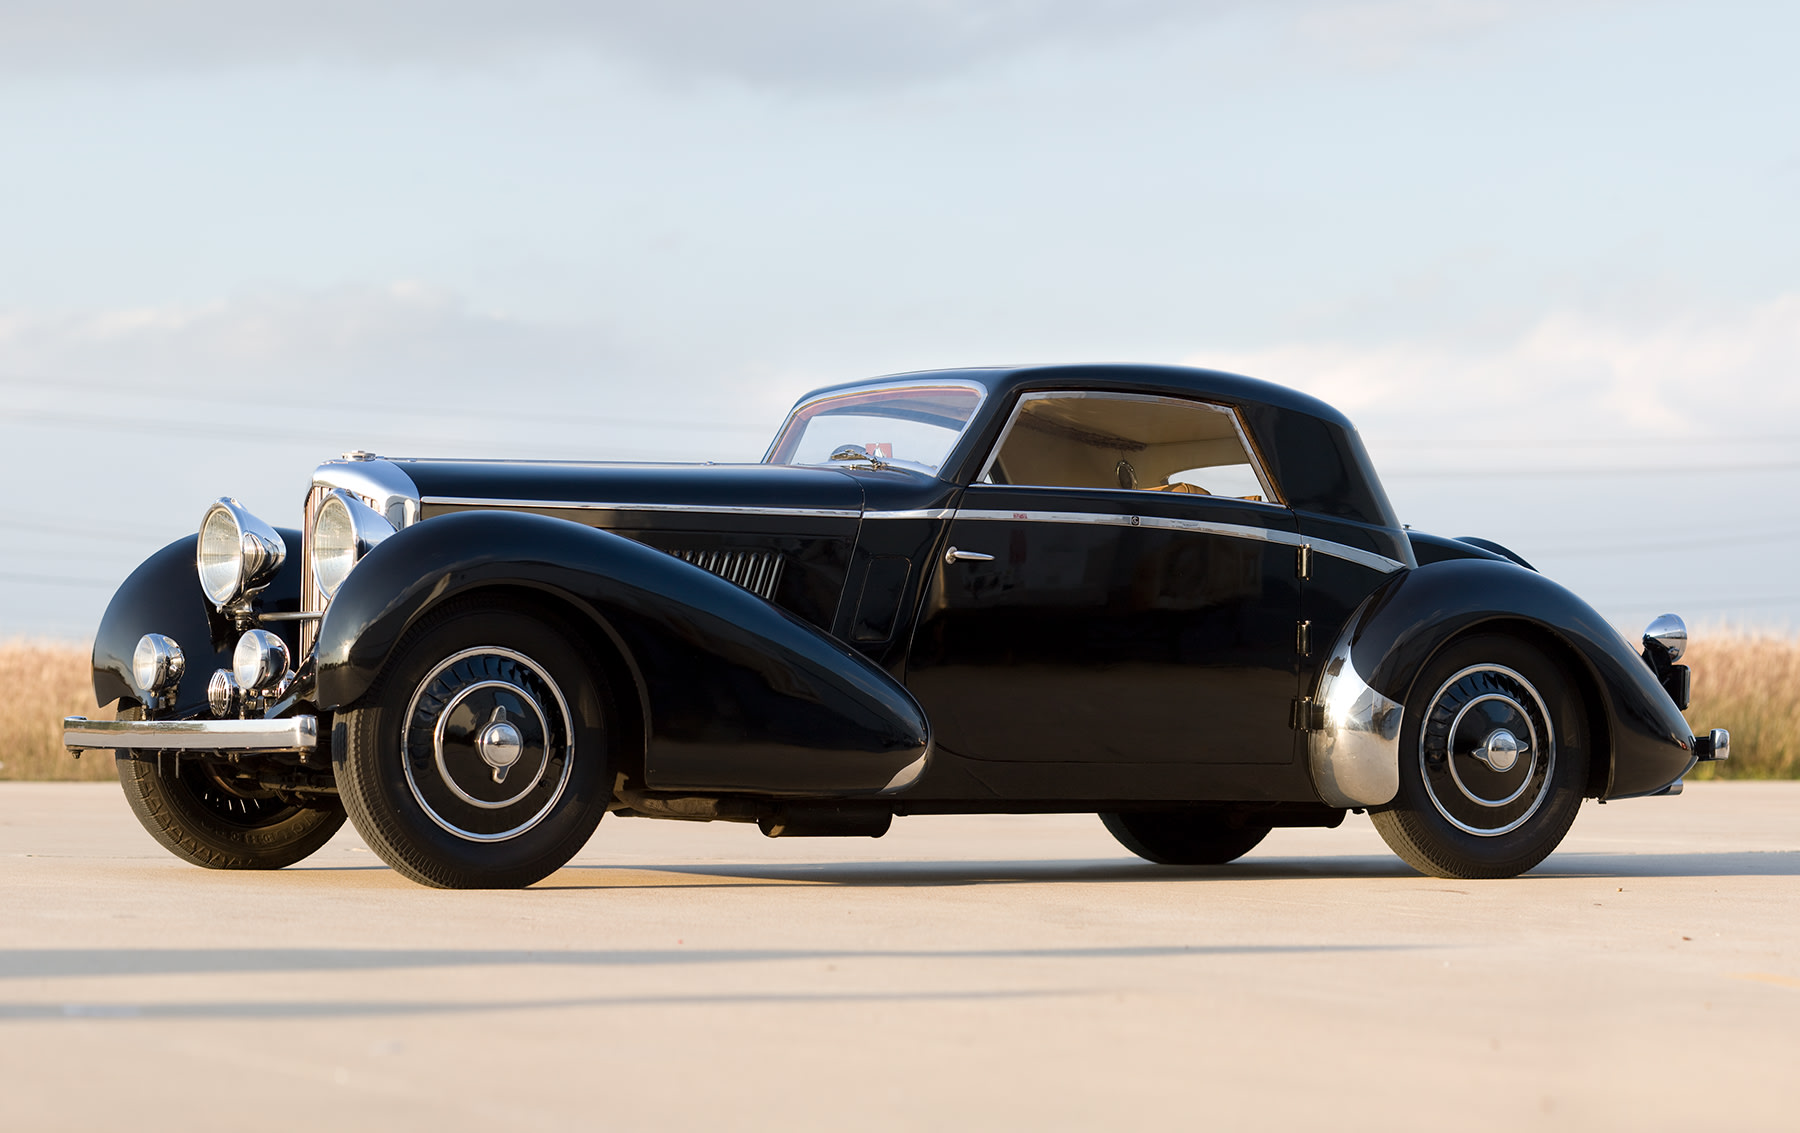 1937 Bentley 4 1/4 Litre Fixed Head Sport Coupe